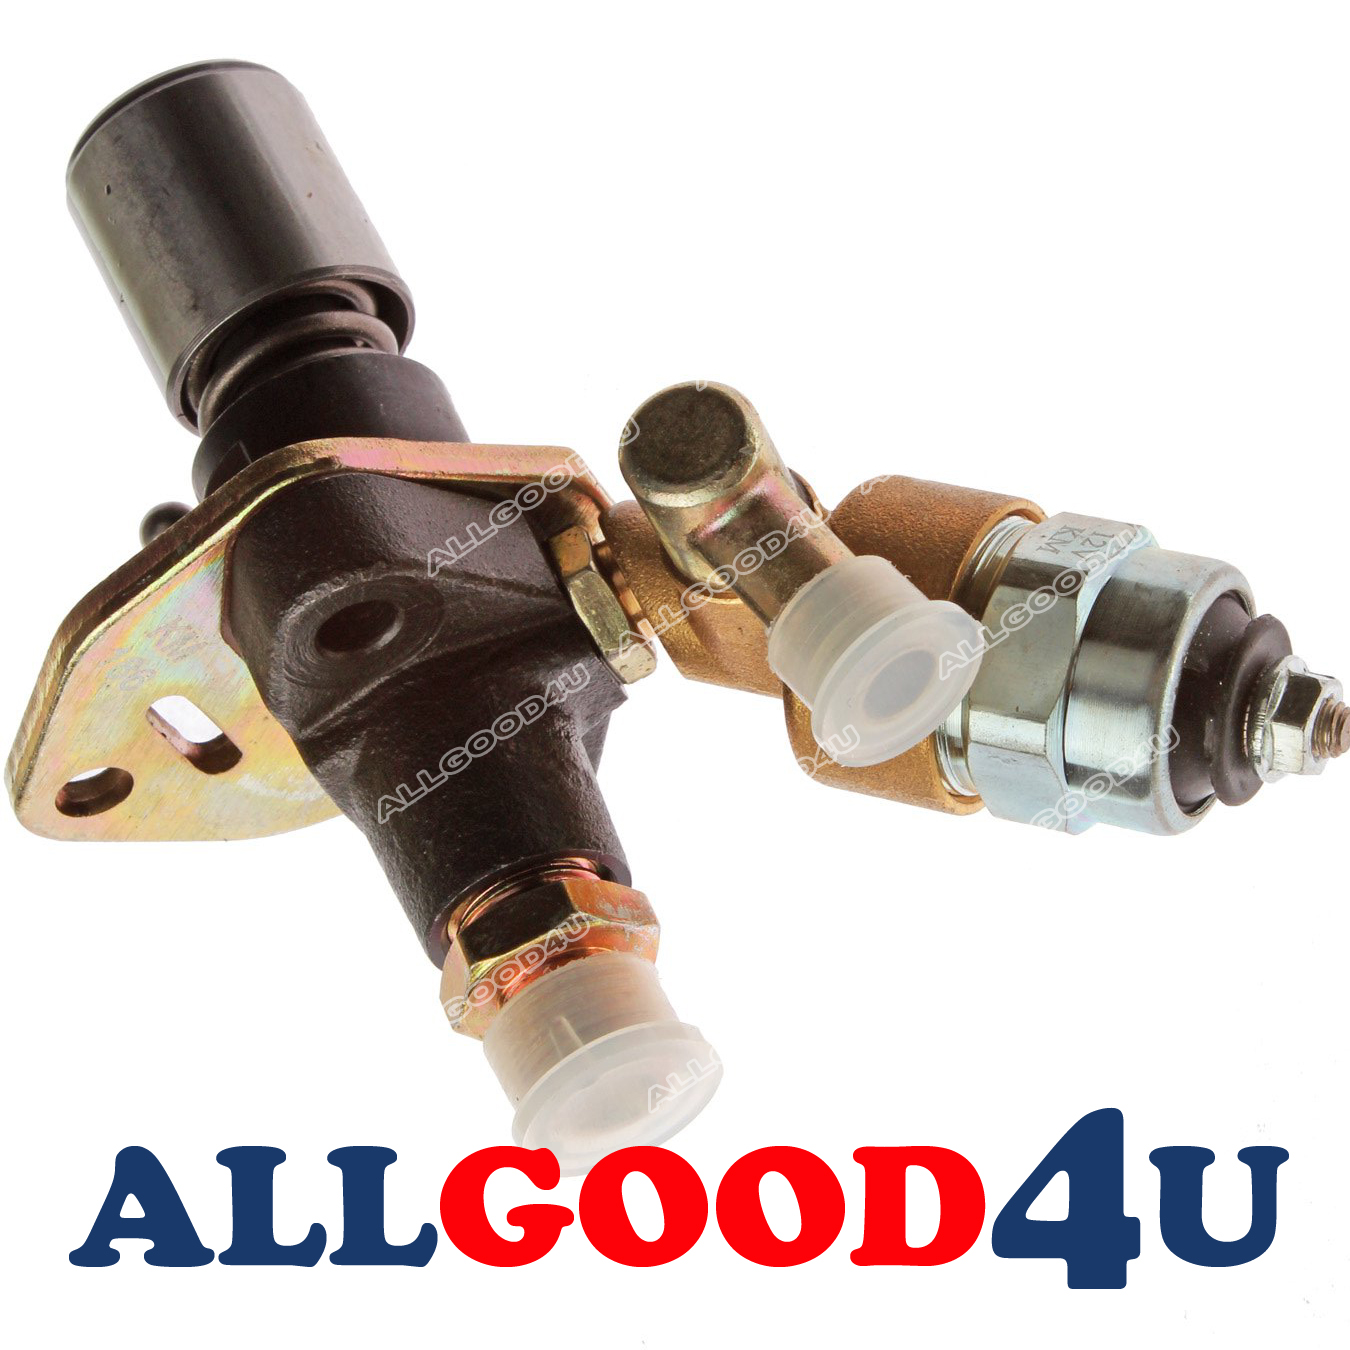 Fuel Injector Pump 186 186F Diesel with solenoid for Yanmar L100 10HP Generator